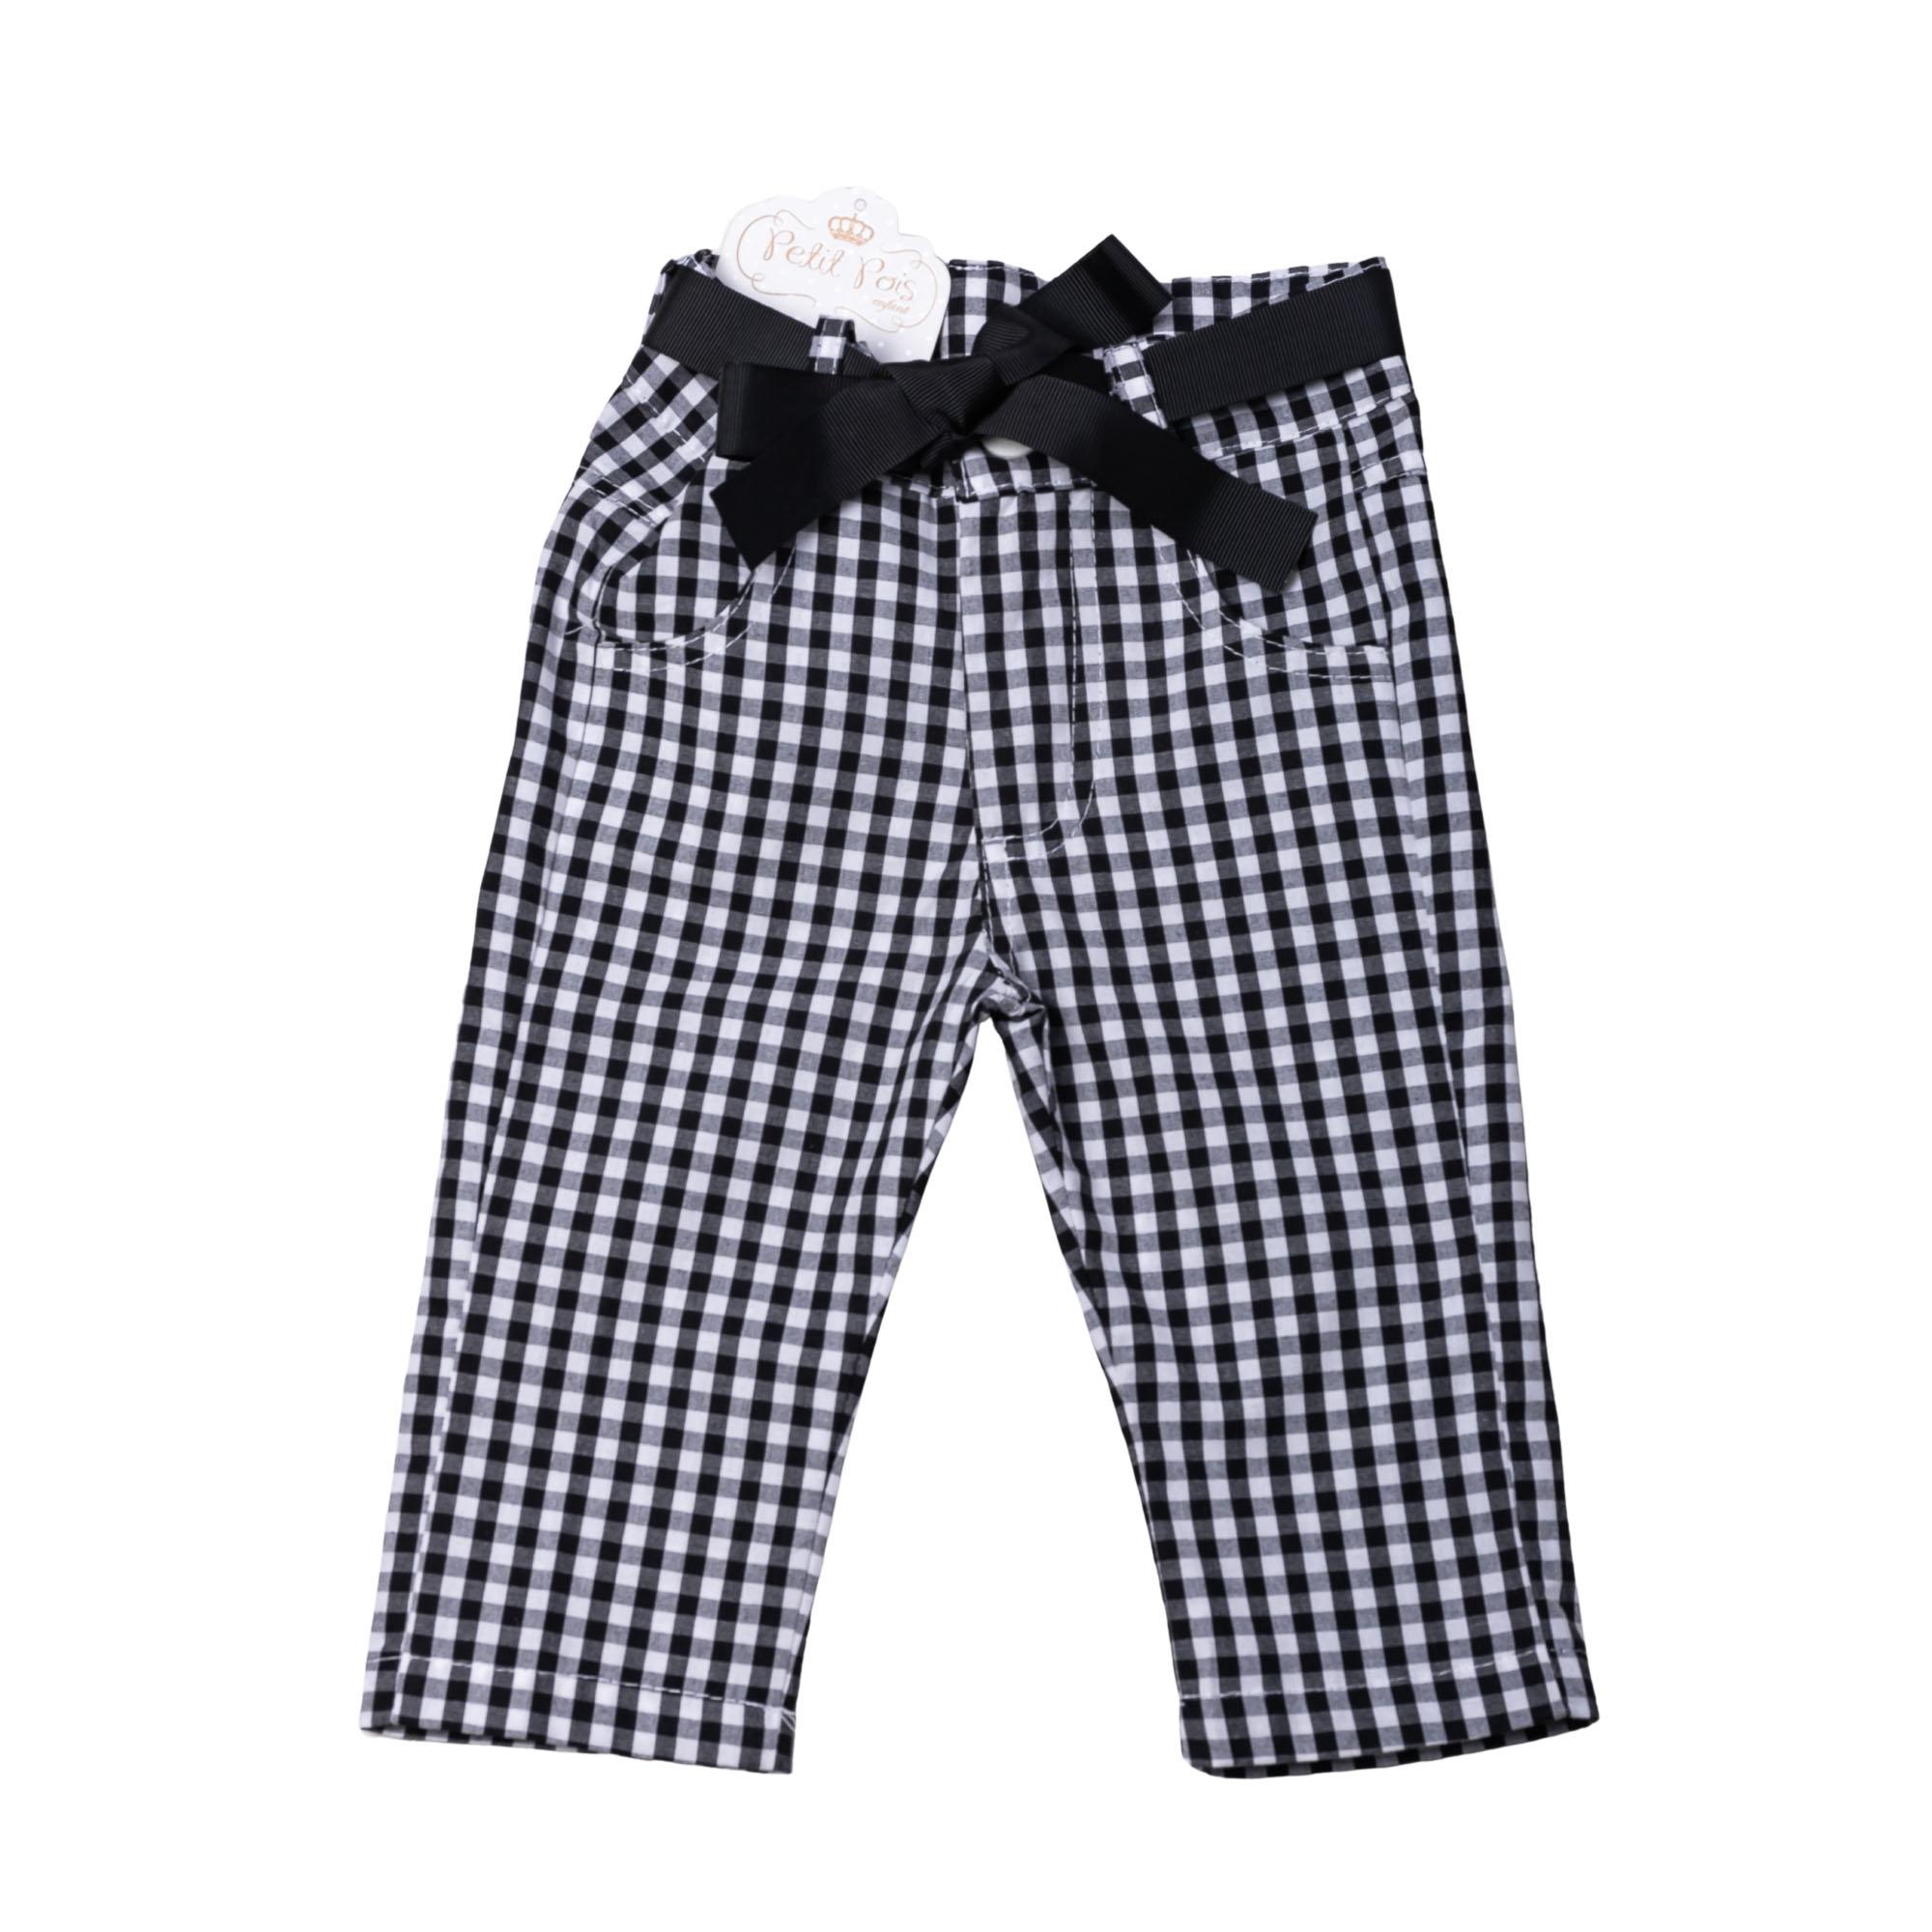 Conjunto xadrez bebê com body e calça - Branco e preto